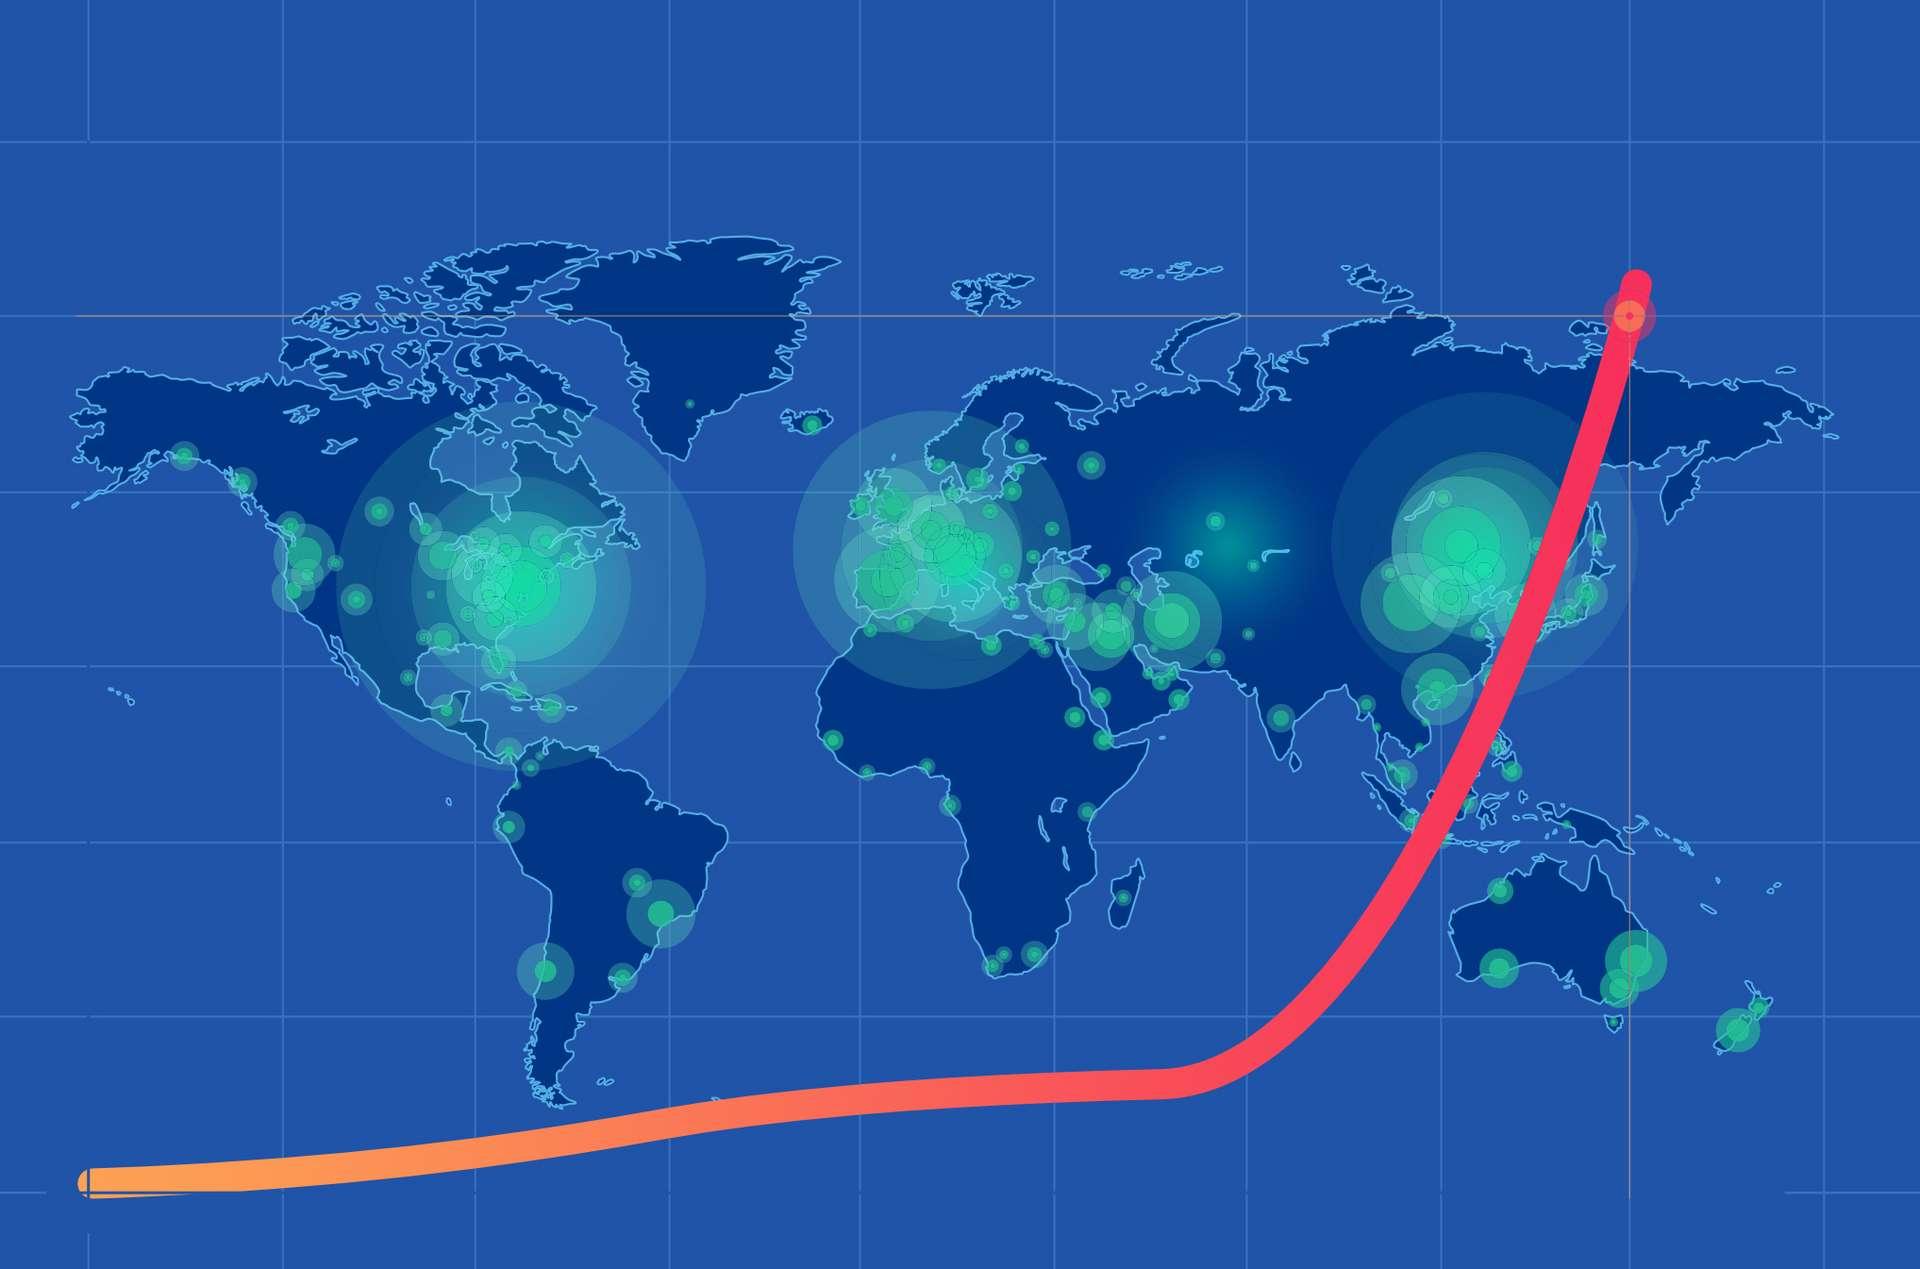 https://cdn.futura-sciences.com/buildsv6/images/largeoriginal/2/a/0/2a0804e654_50162873_afrique-coronavirus-serhii-adobe-stock.jpg